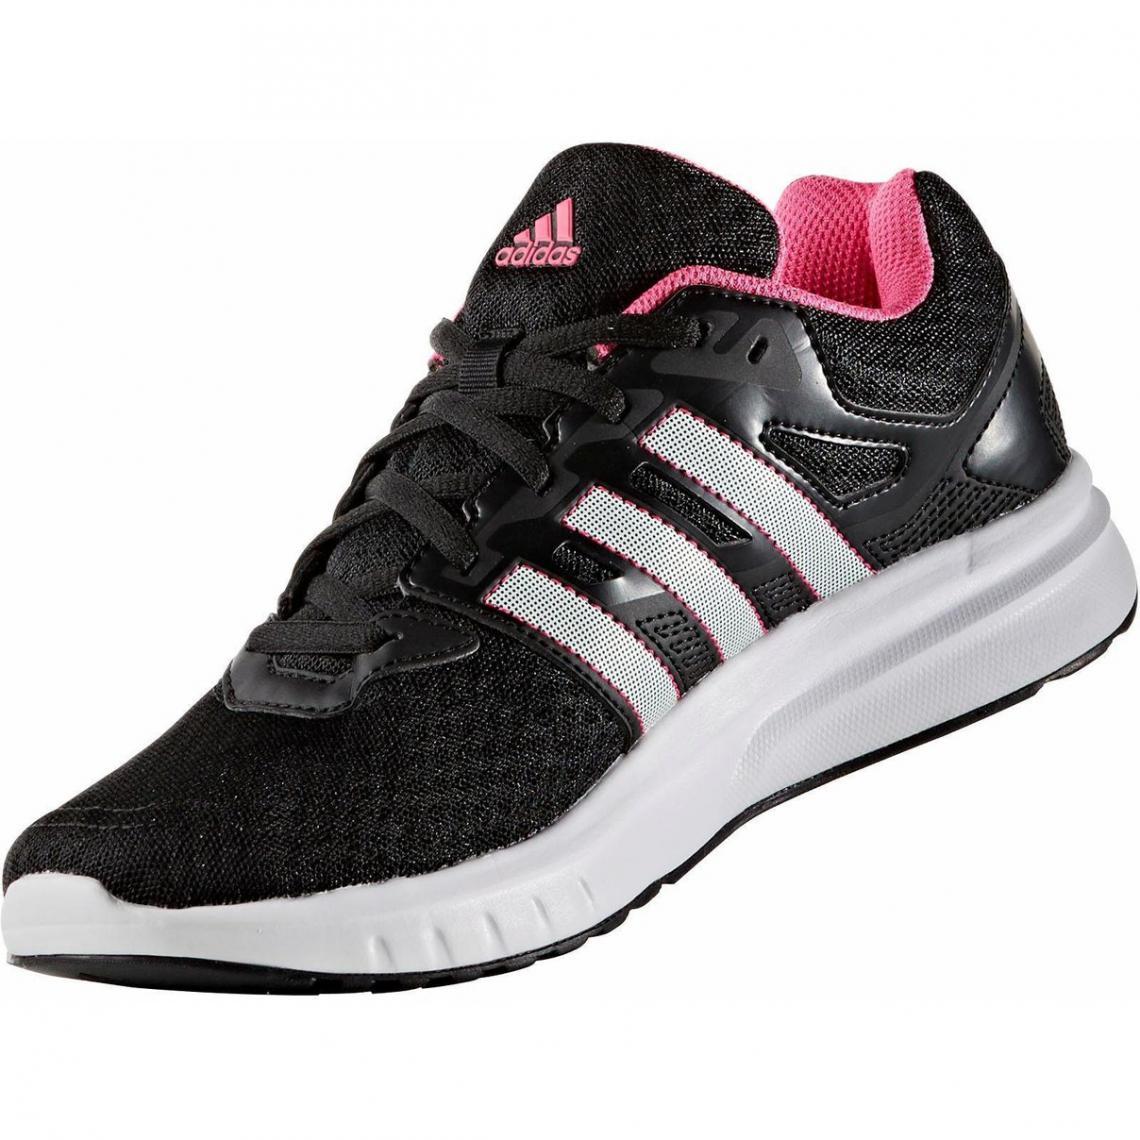 2 Chaussures Running Performance Femme Galaxy Adidas